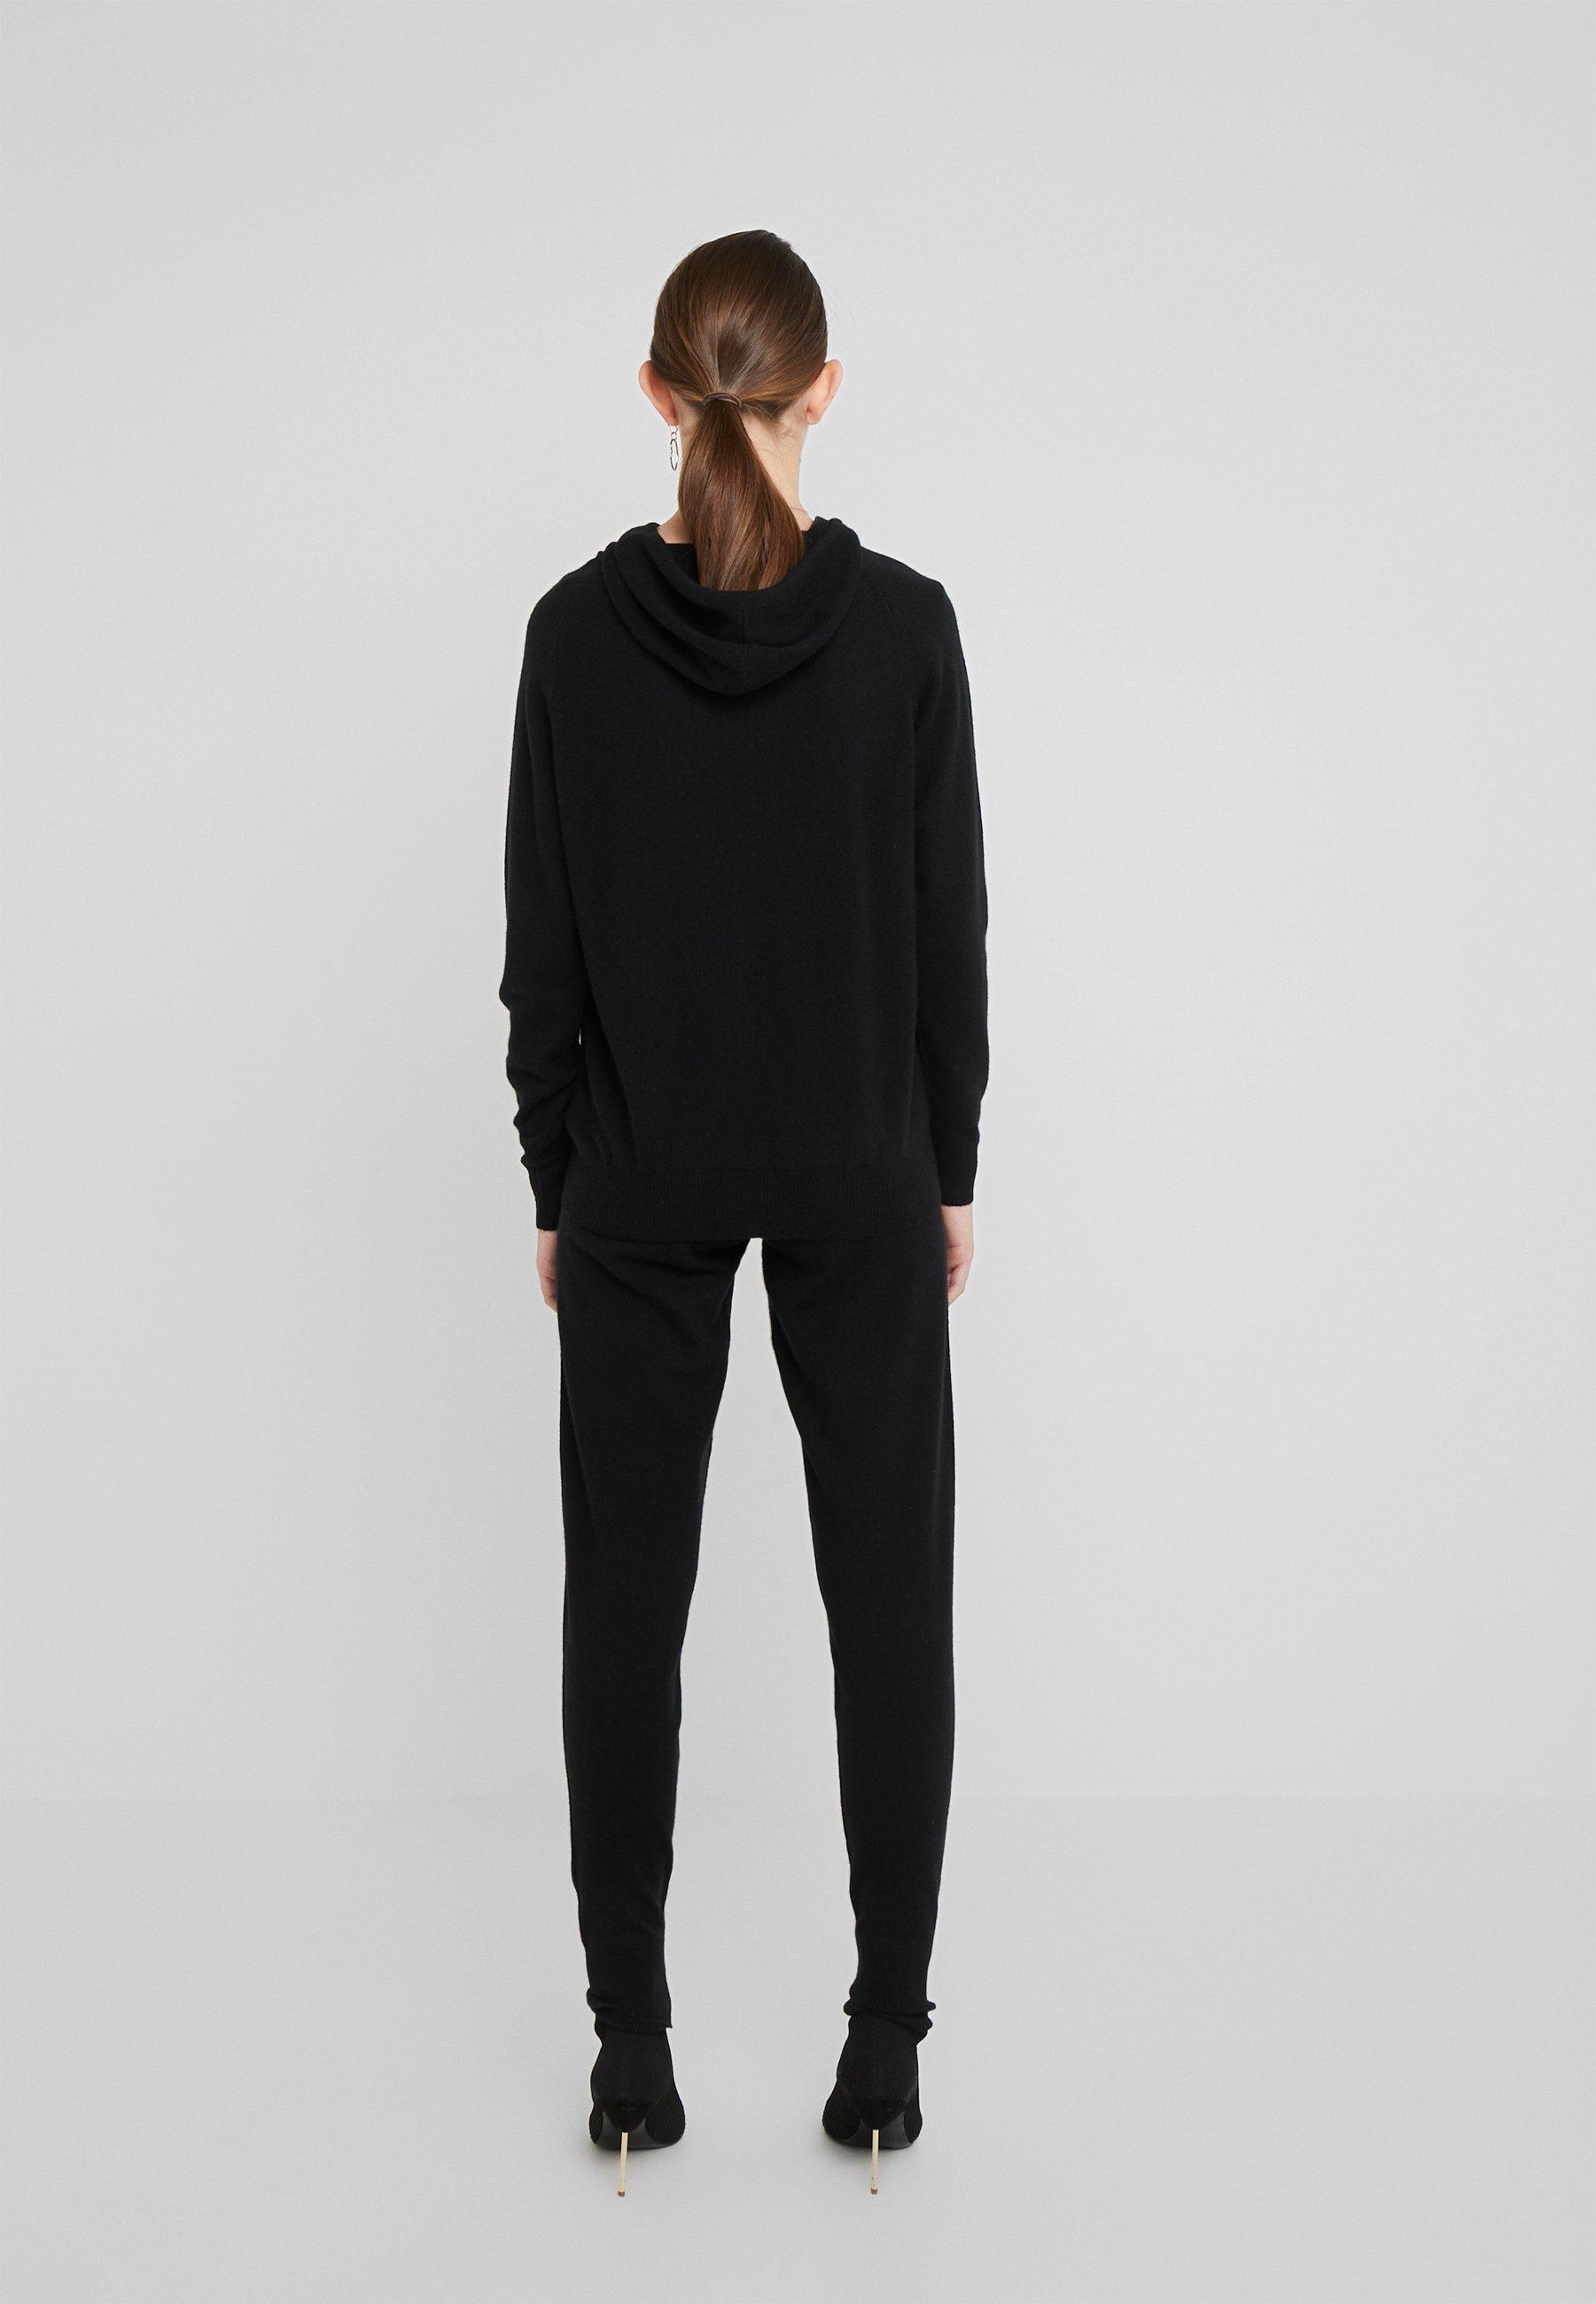 Particular Discount Women's Clothing Davida Cashmere FRONT POCKET HOODIE Hoodie black P46da3JbZ